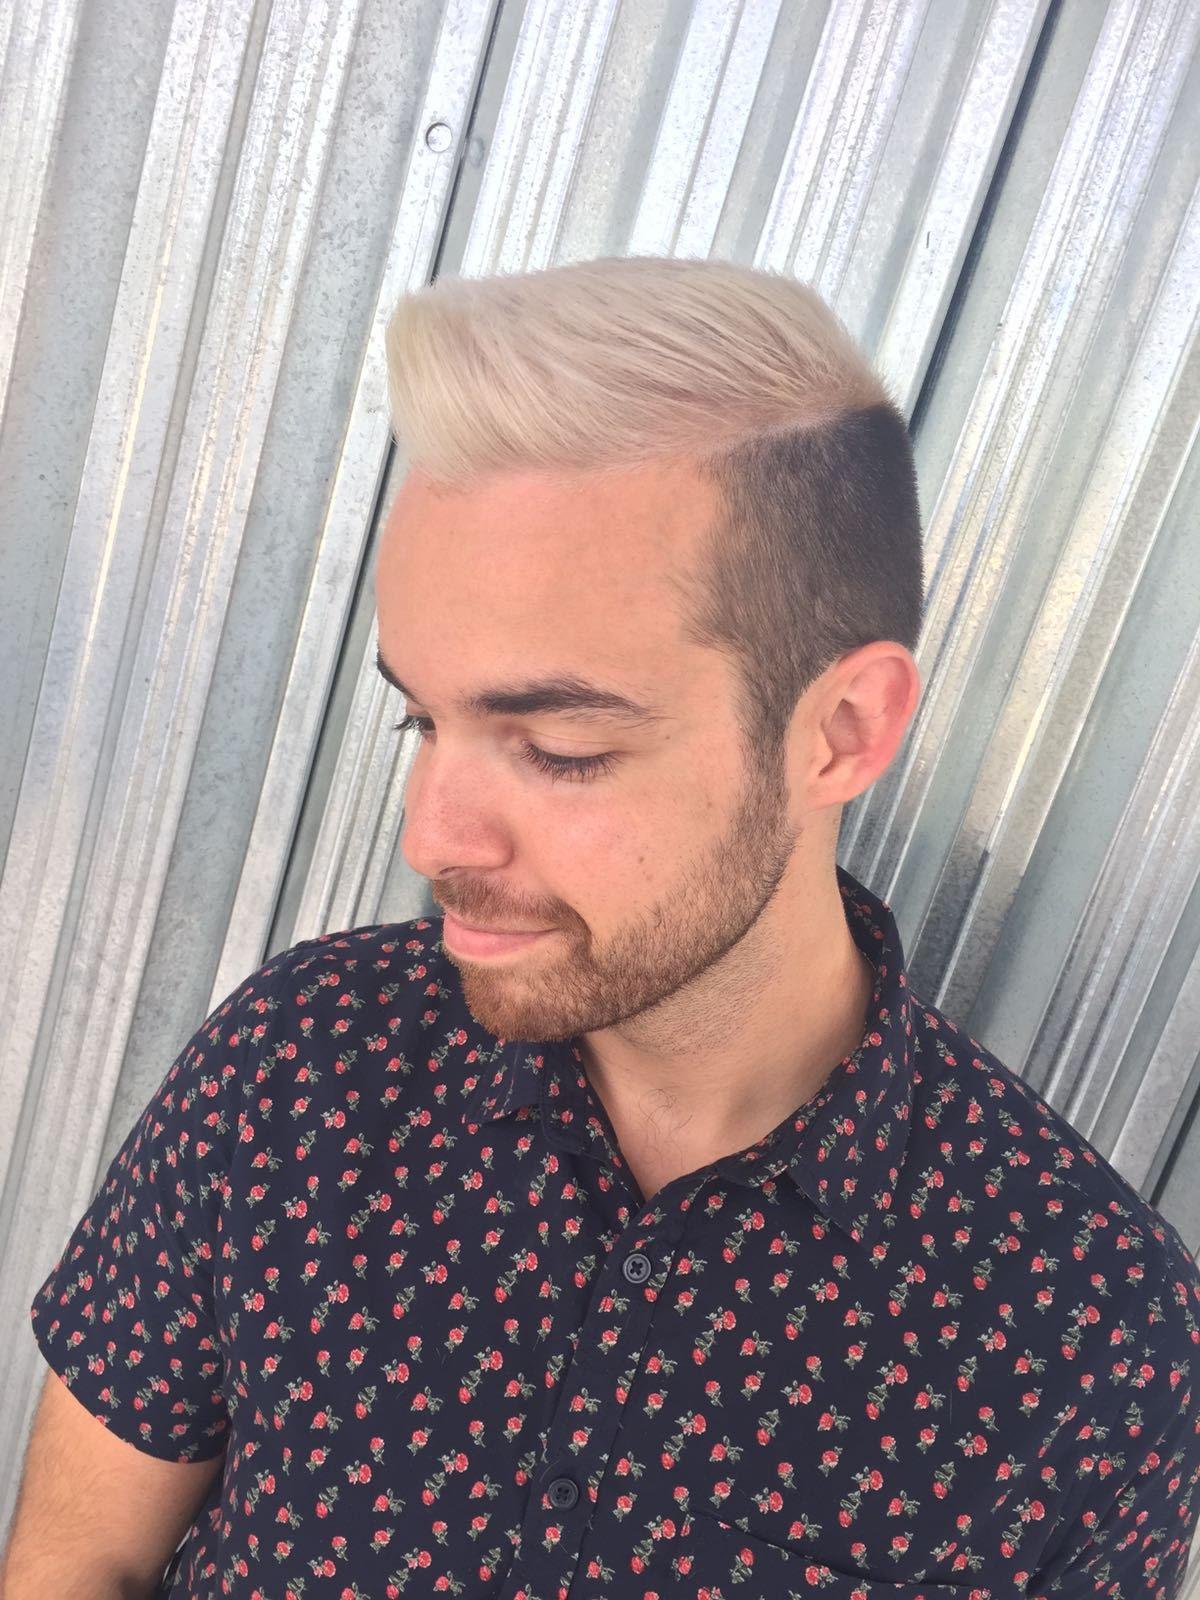 stylish man haircut